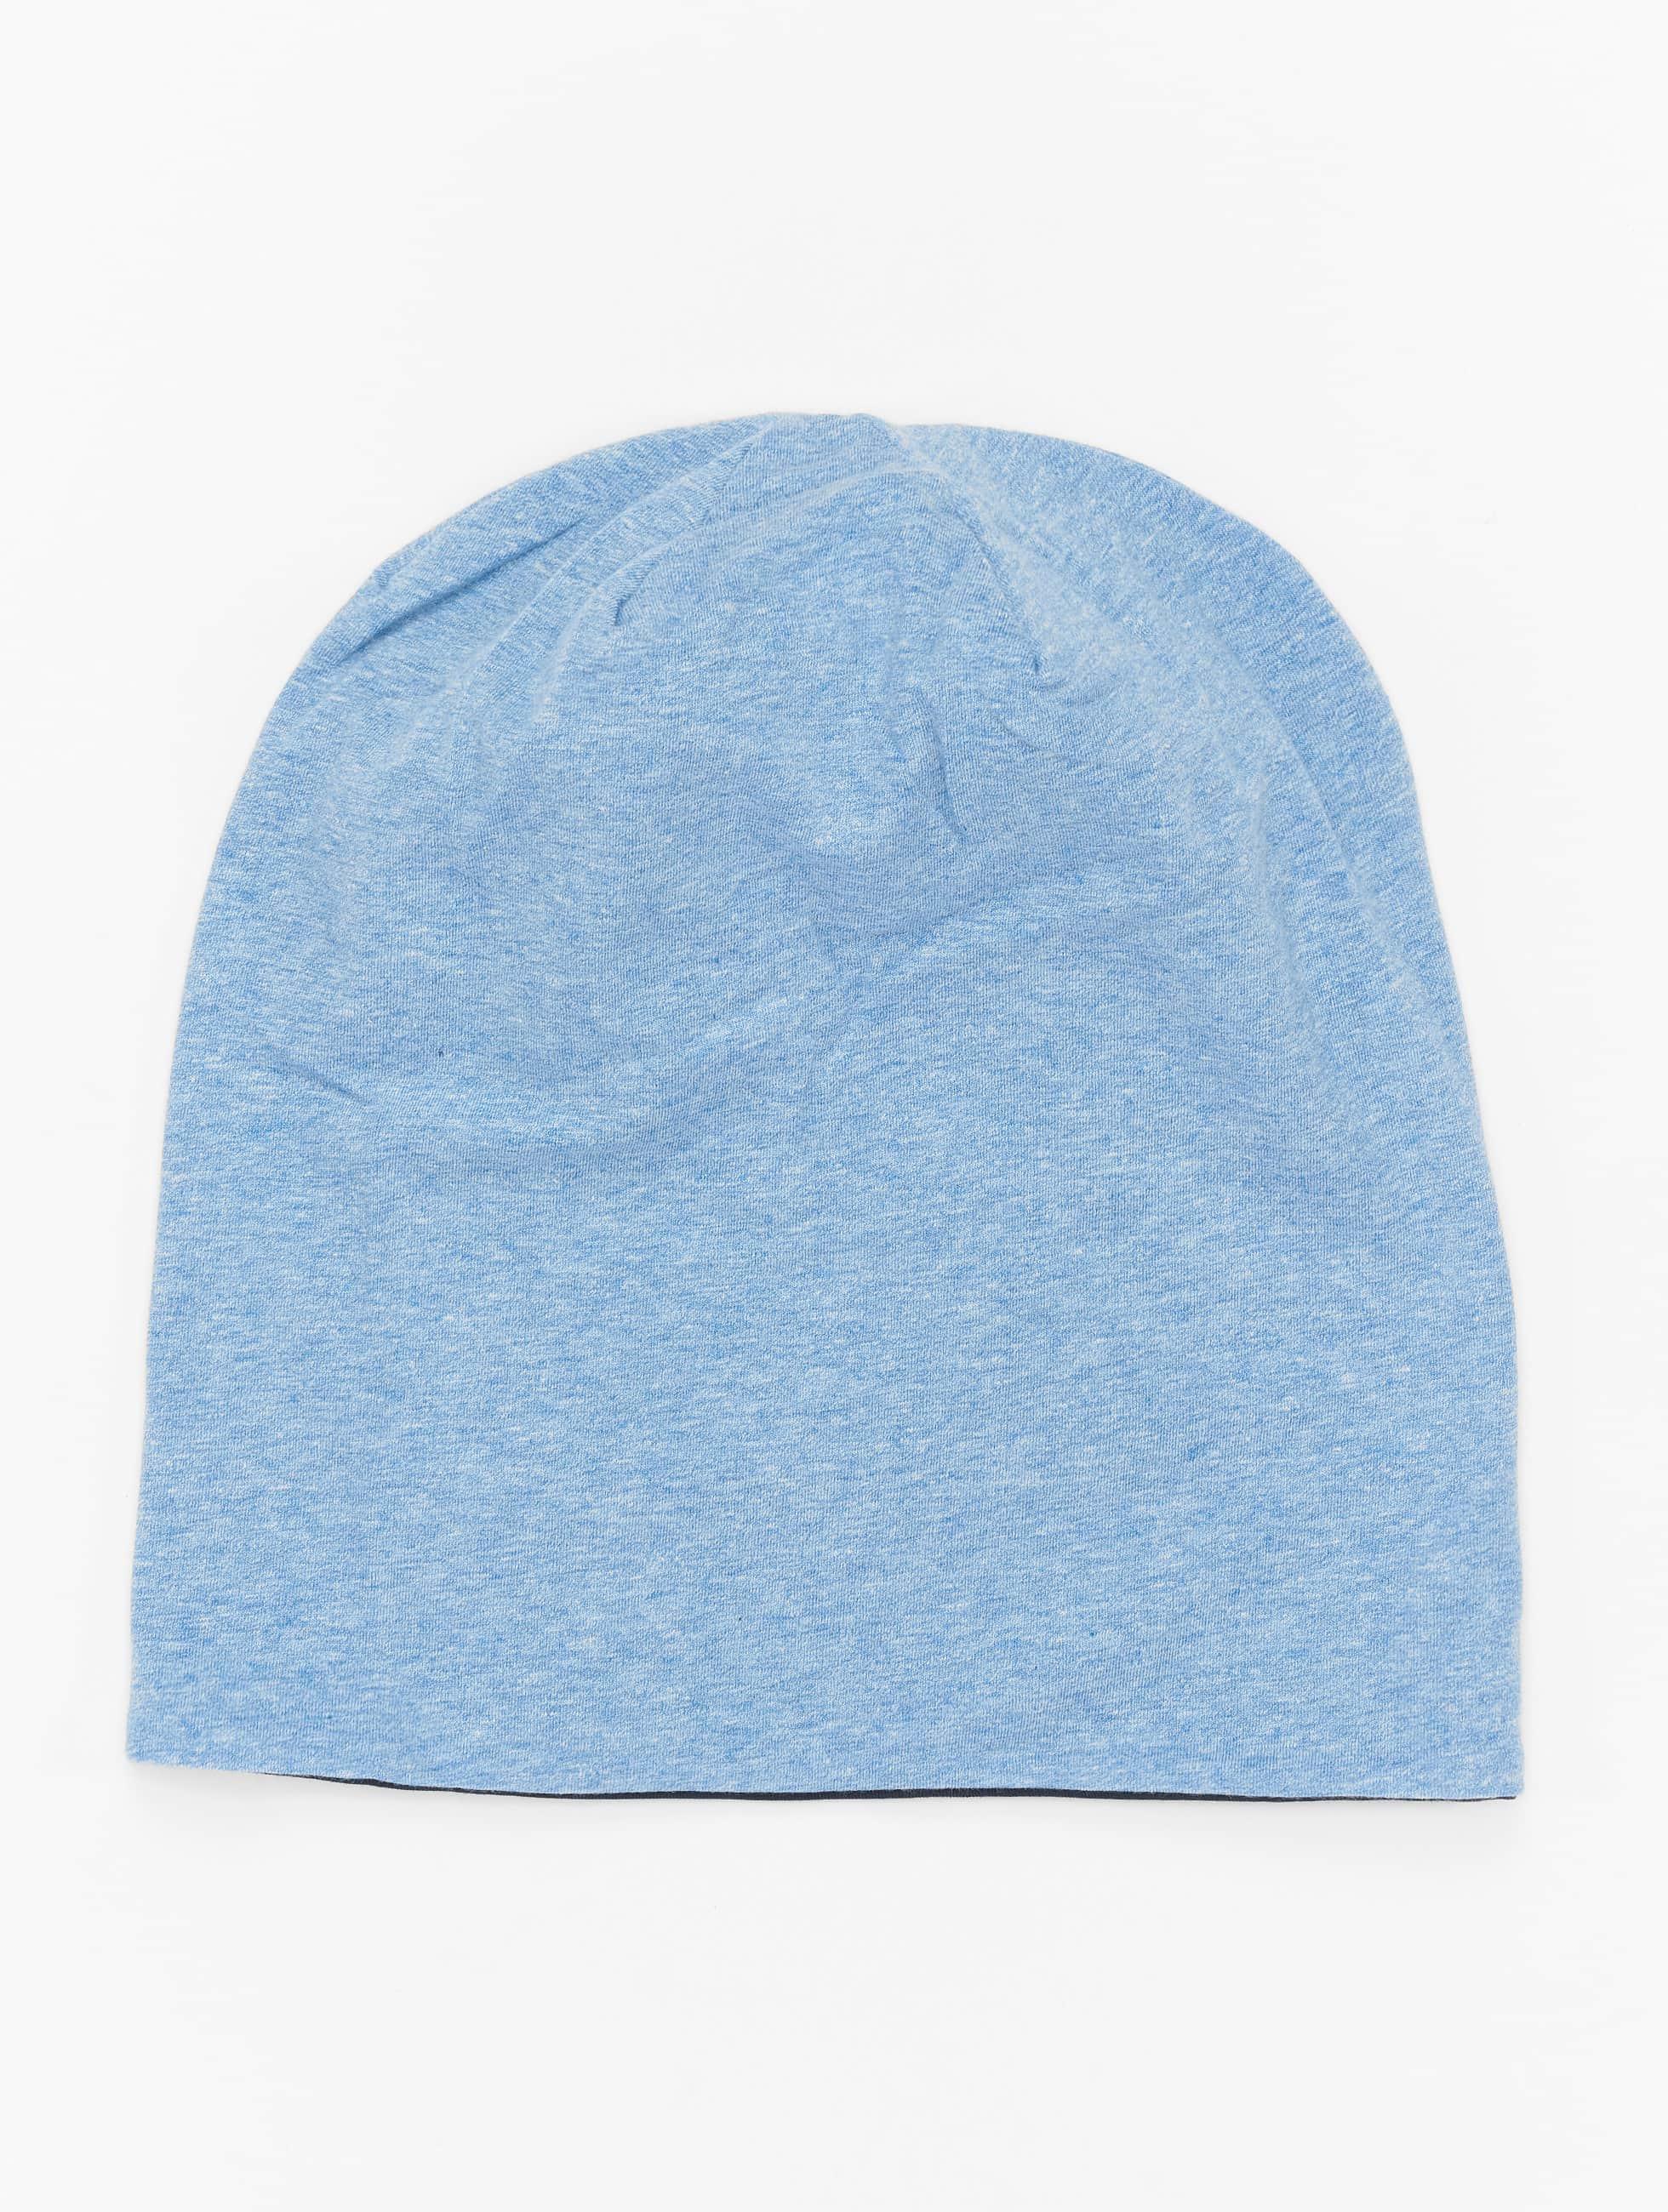 MSTRDS Bonnet Jersey Reversible bleu